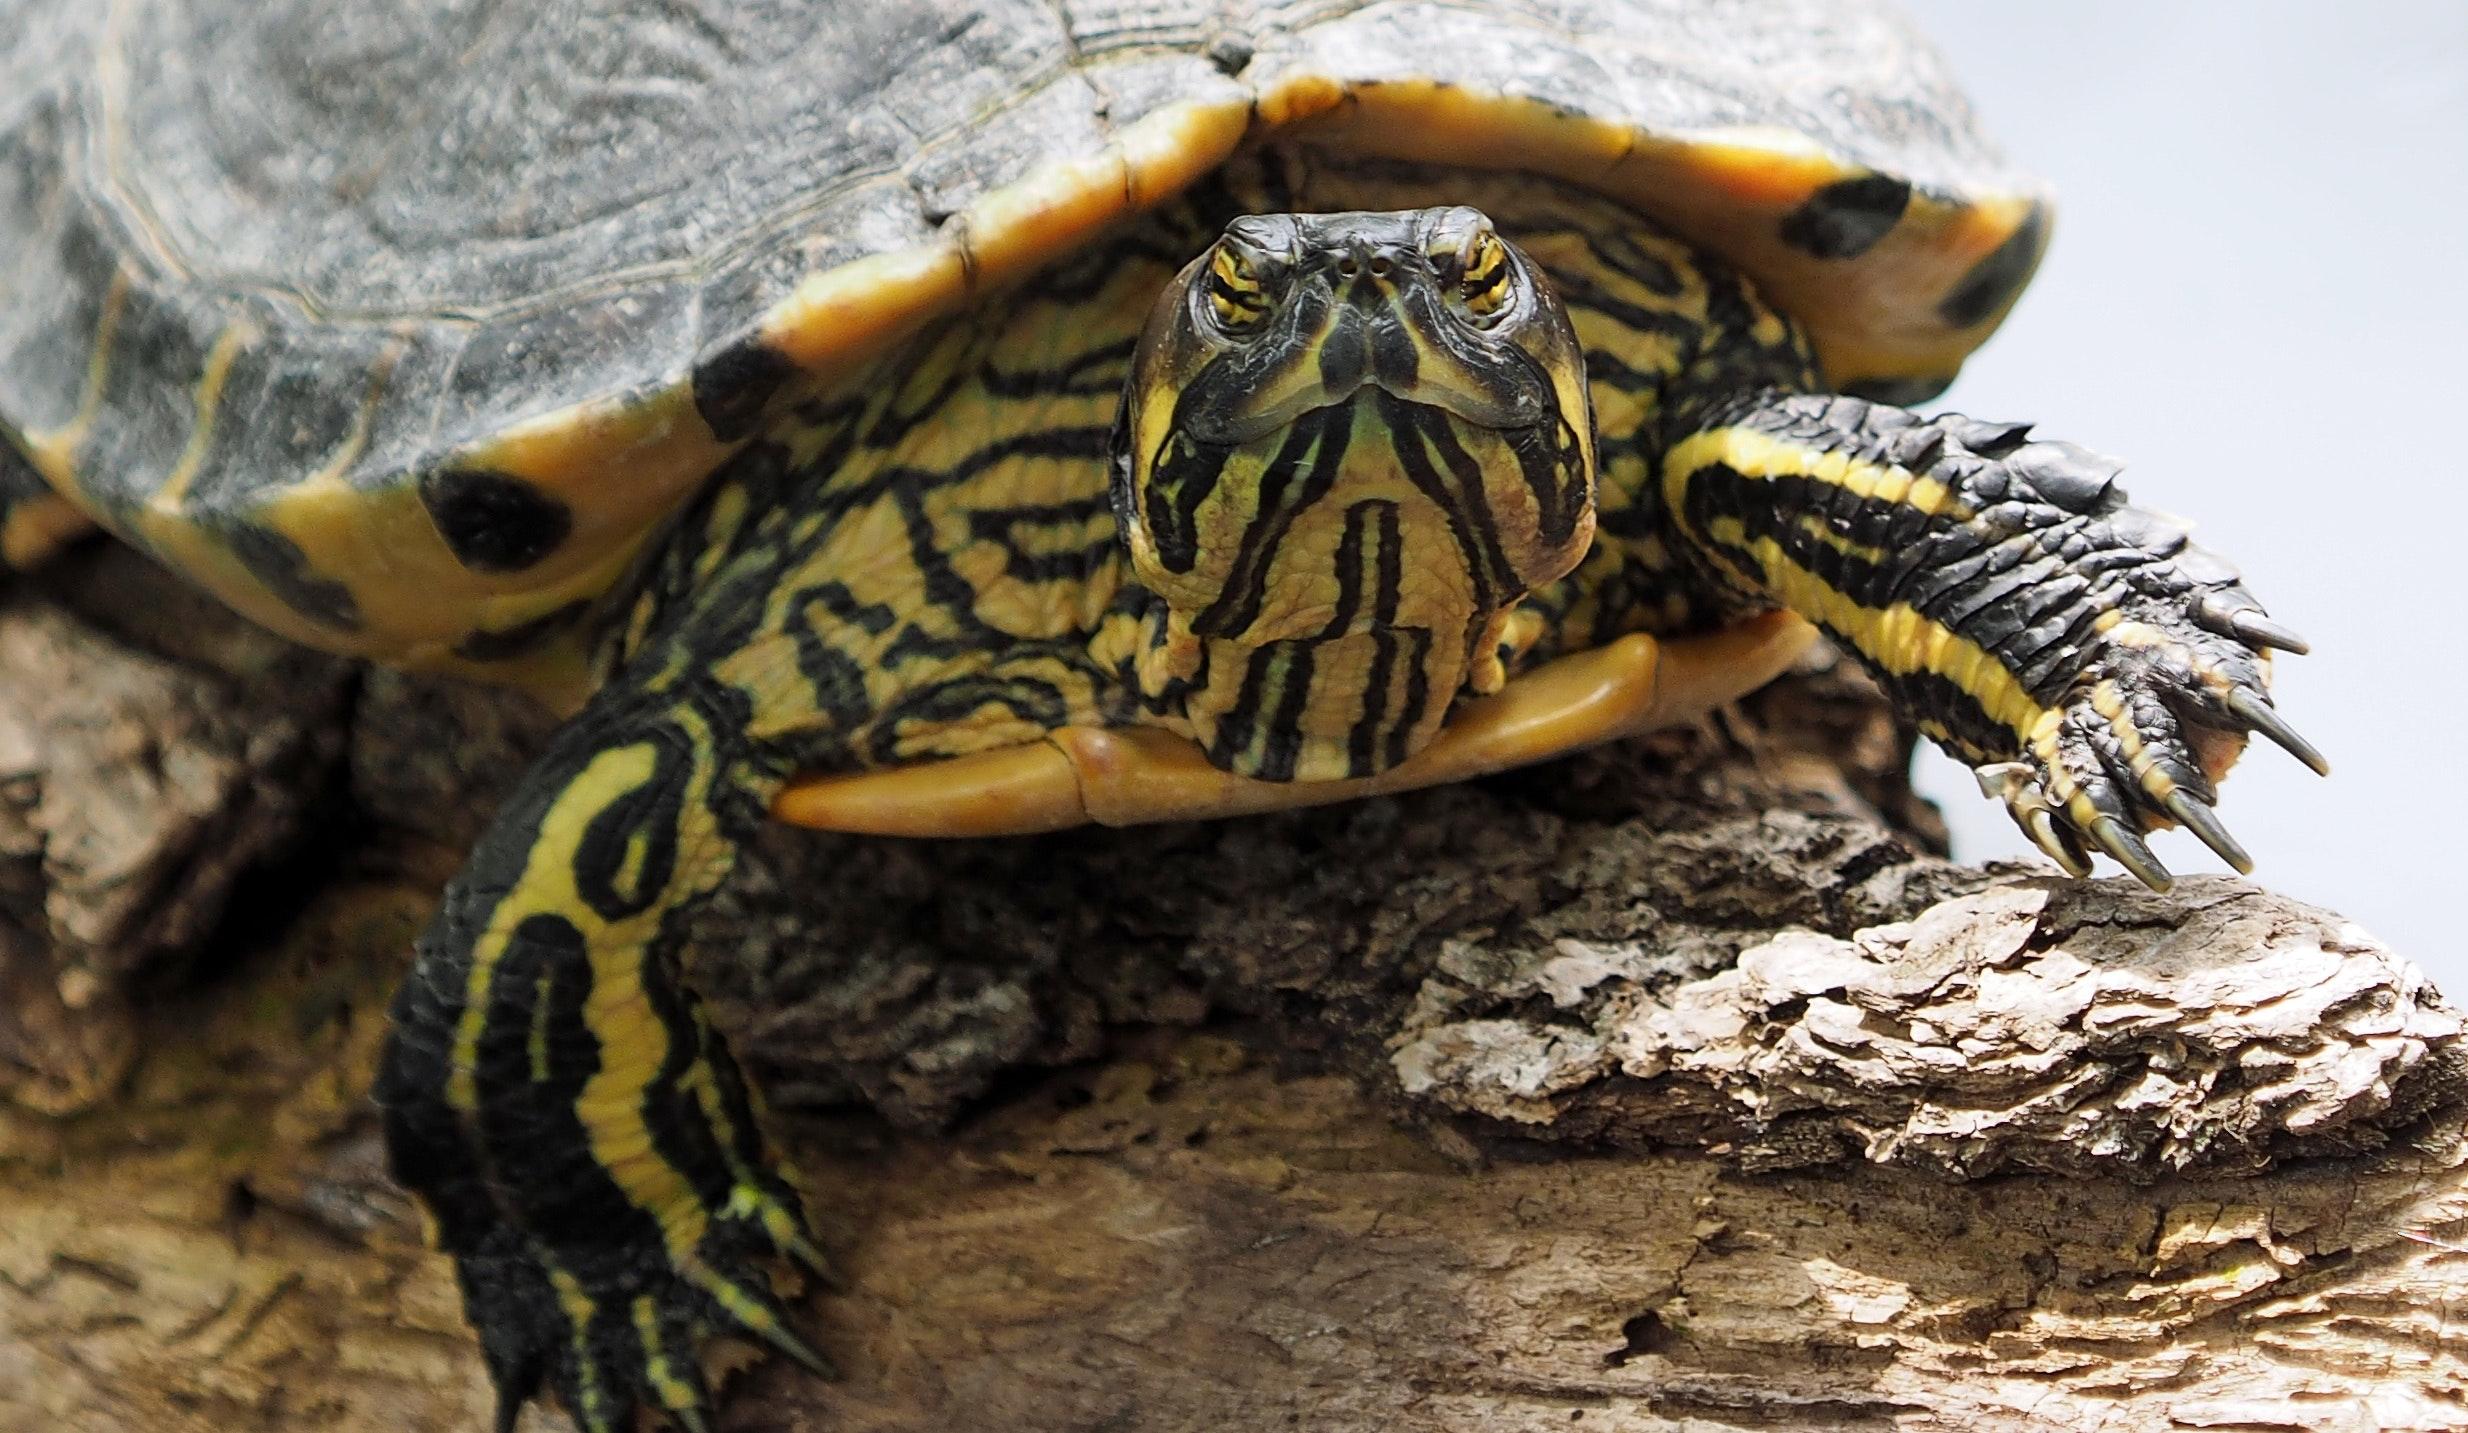 Turtle pet close-up photo